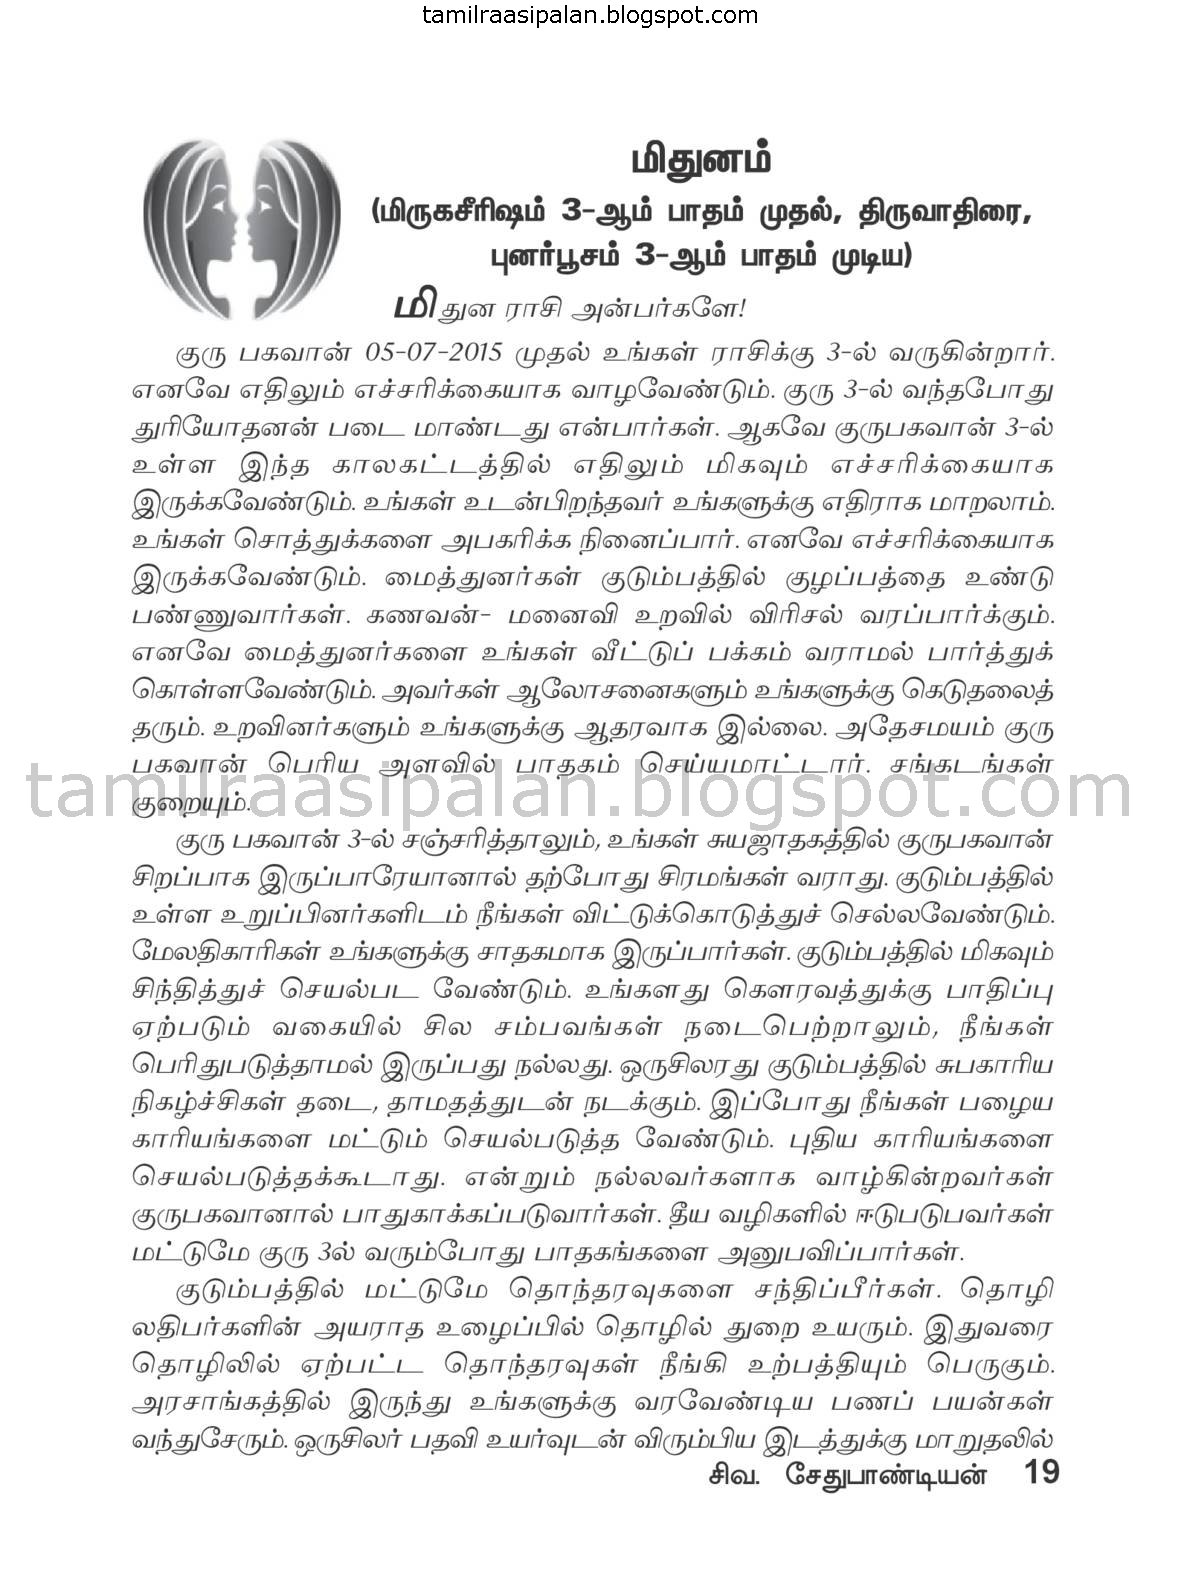 Guru peyarchi palan in tamil guru peyarchi palan in tamil